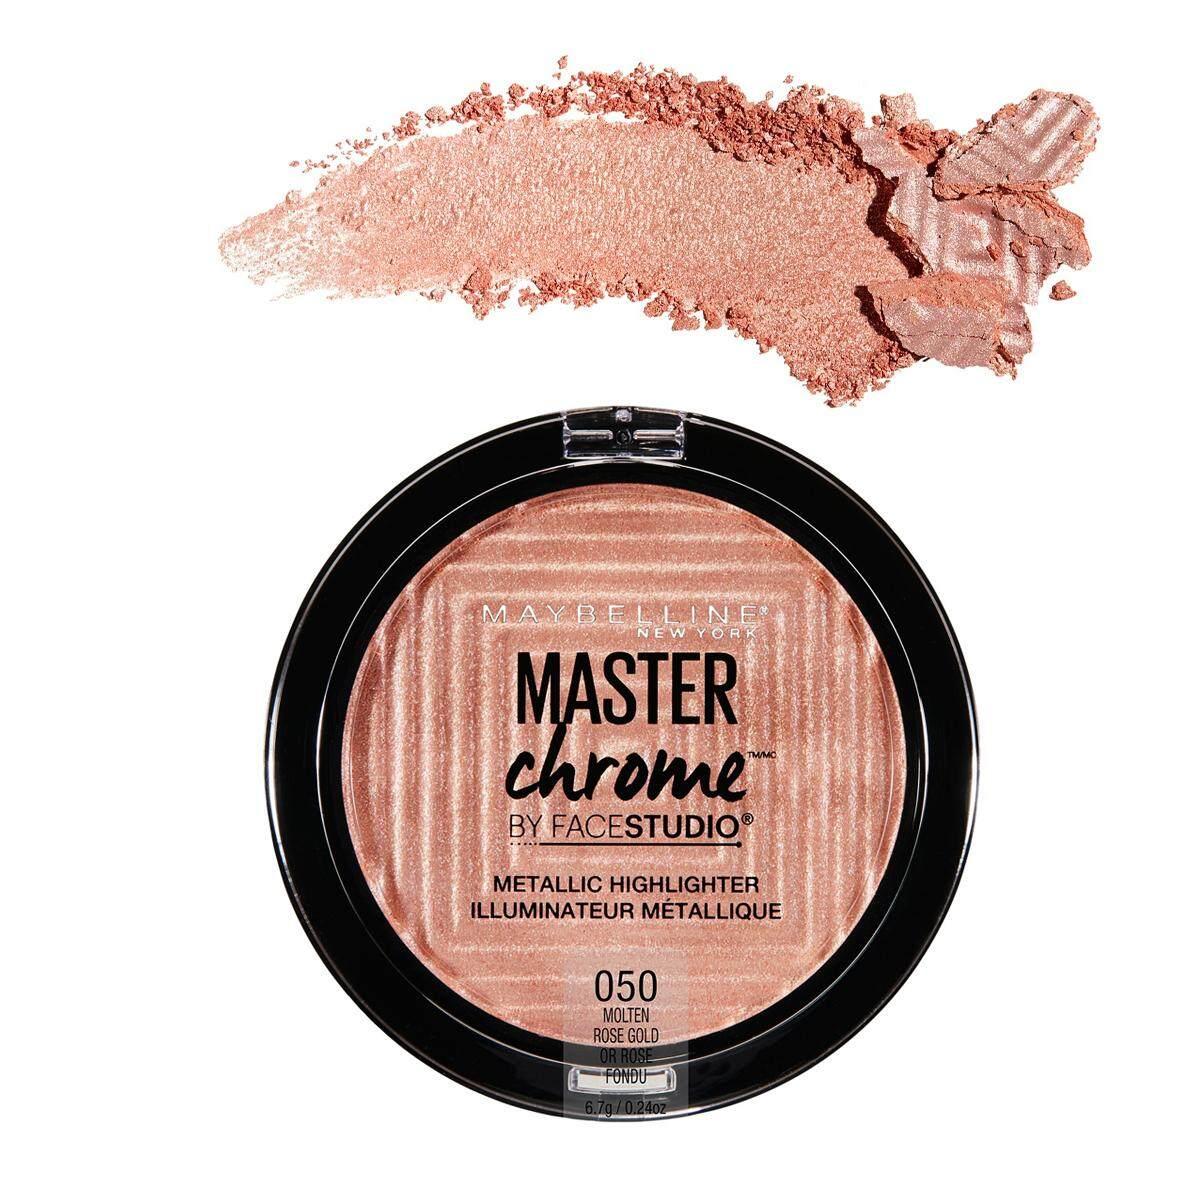 Maybelline V Face Blush Contour Peach Daftar Harga Terkini Dan Meyne Facestudio Master Chrome Metallic Highlighter Molten Rose Gold